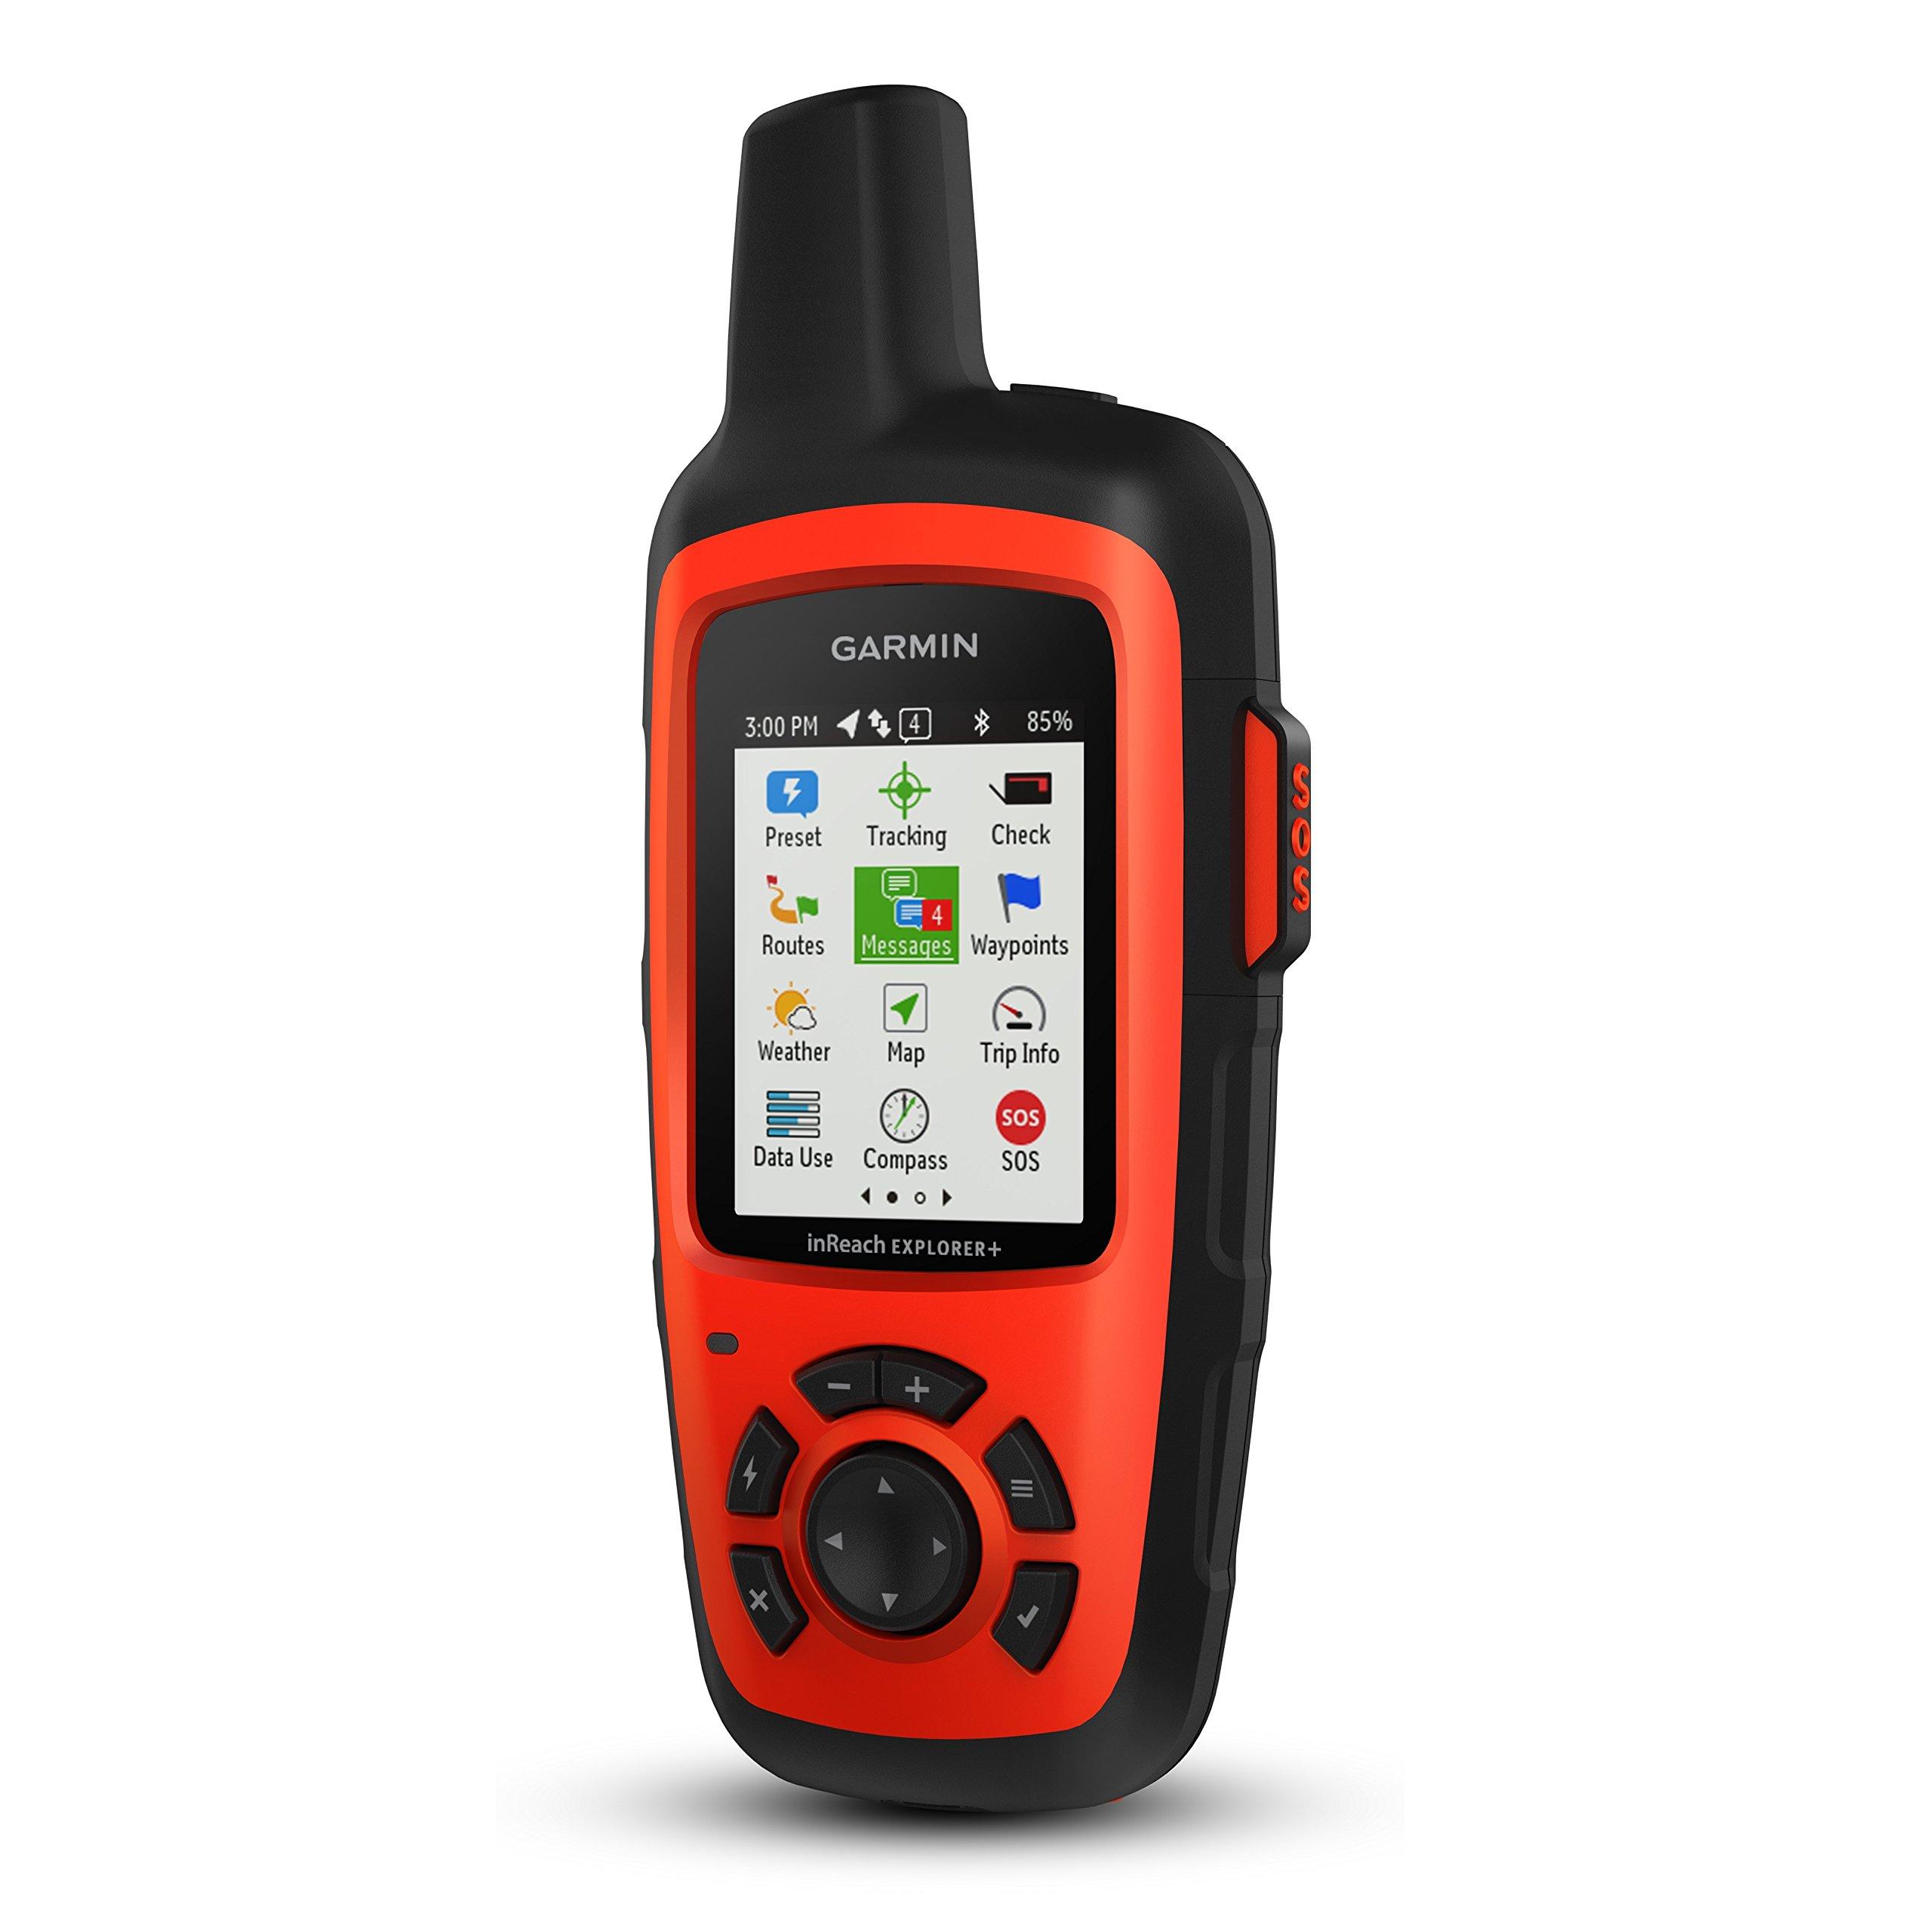 Garmin InReach Explorer+ Handheld Satellite Communicator with GPS Navigation, Maps, and Sensors 010-01735-10 and Wearable4U Ultimate Power Pack Bundle by Wearable4u (Image #2)